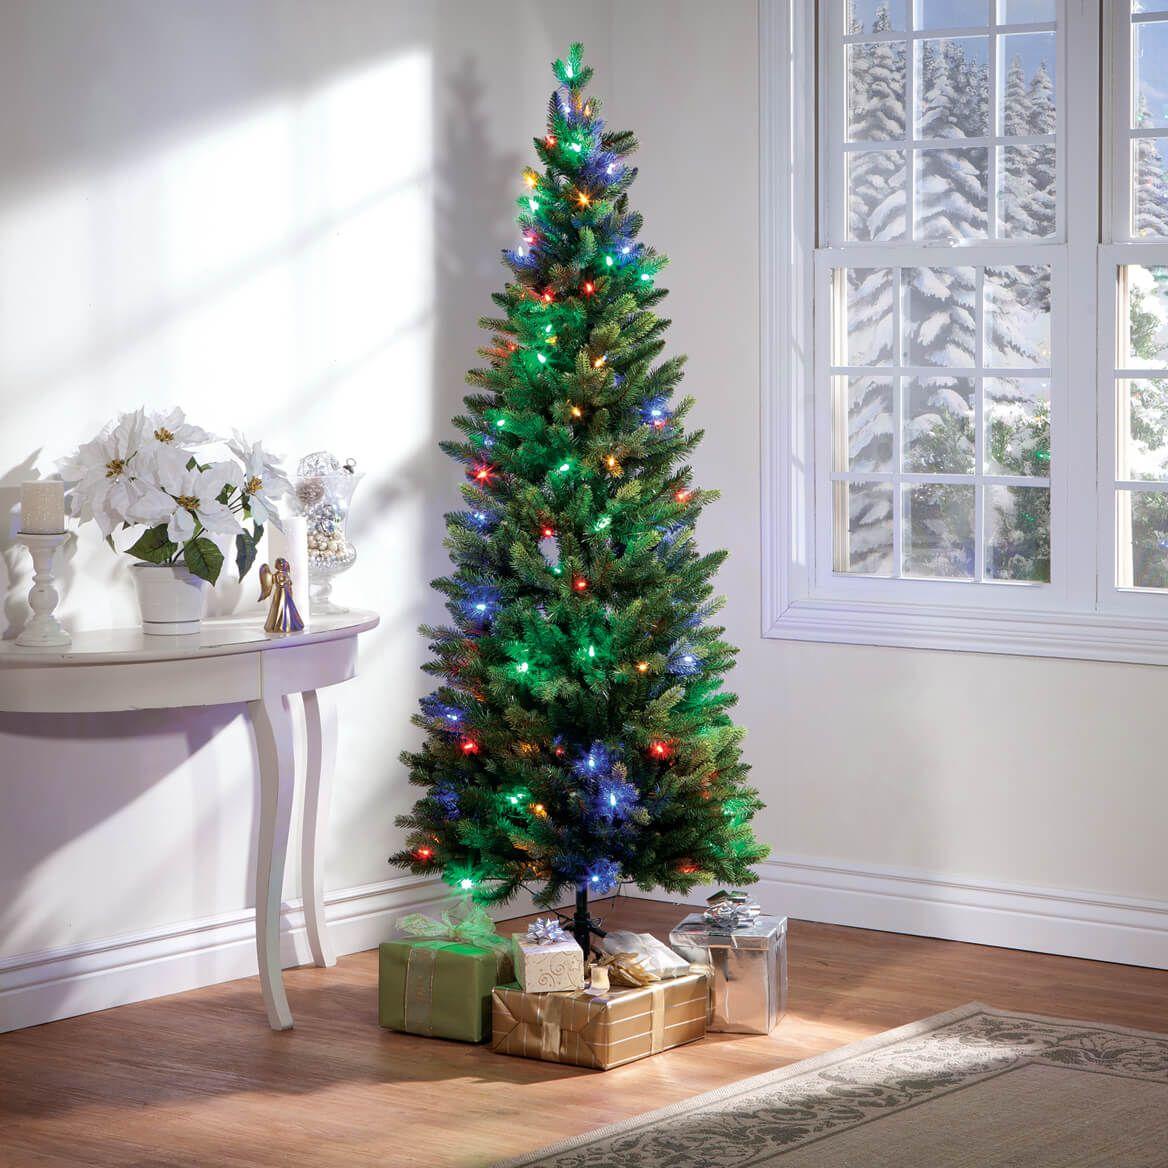 6' Pre-Lit Fraiser-Like Tree by Holiday Peak™     XL-356284